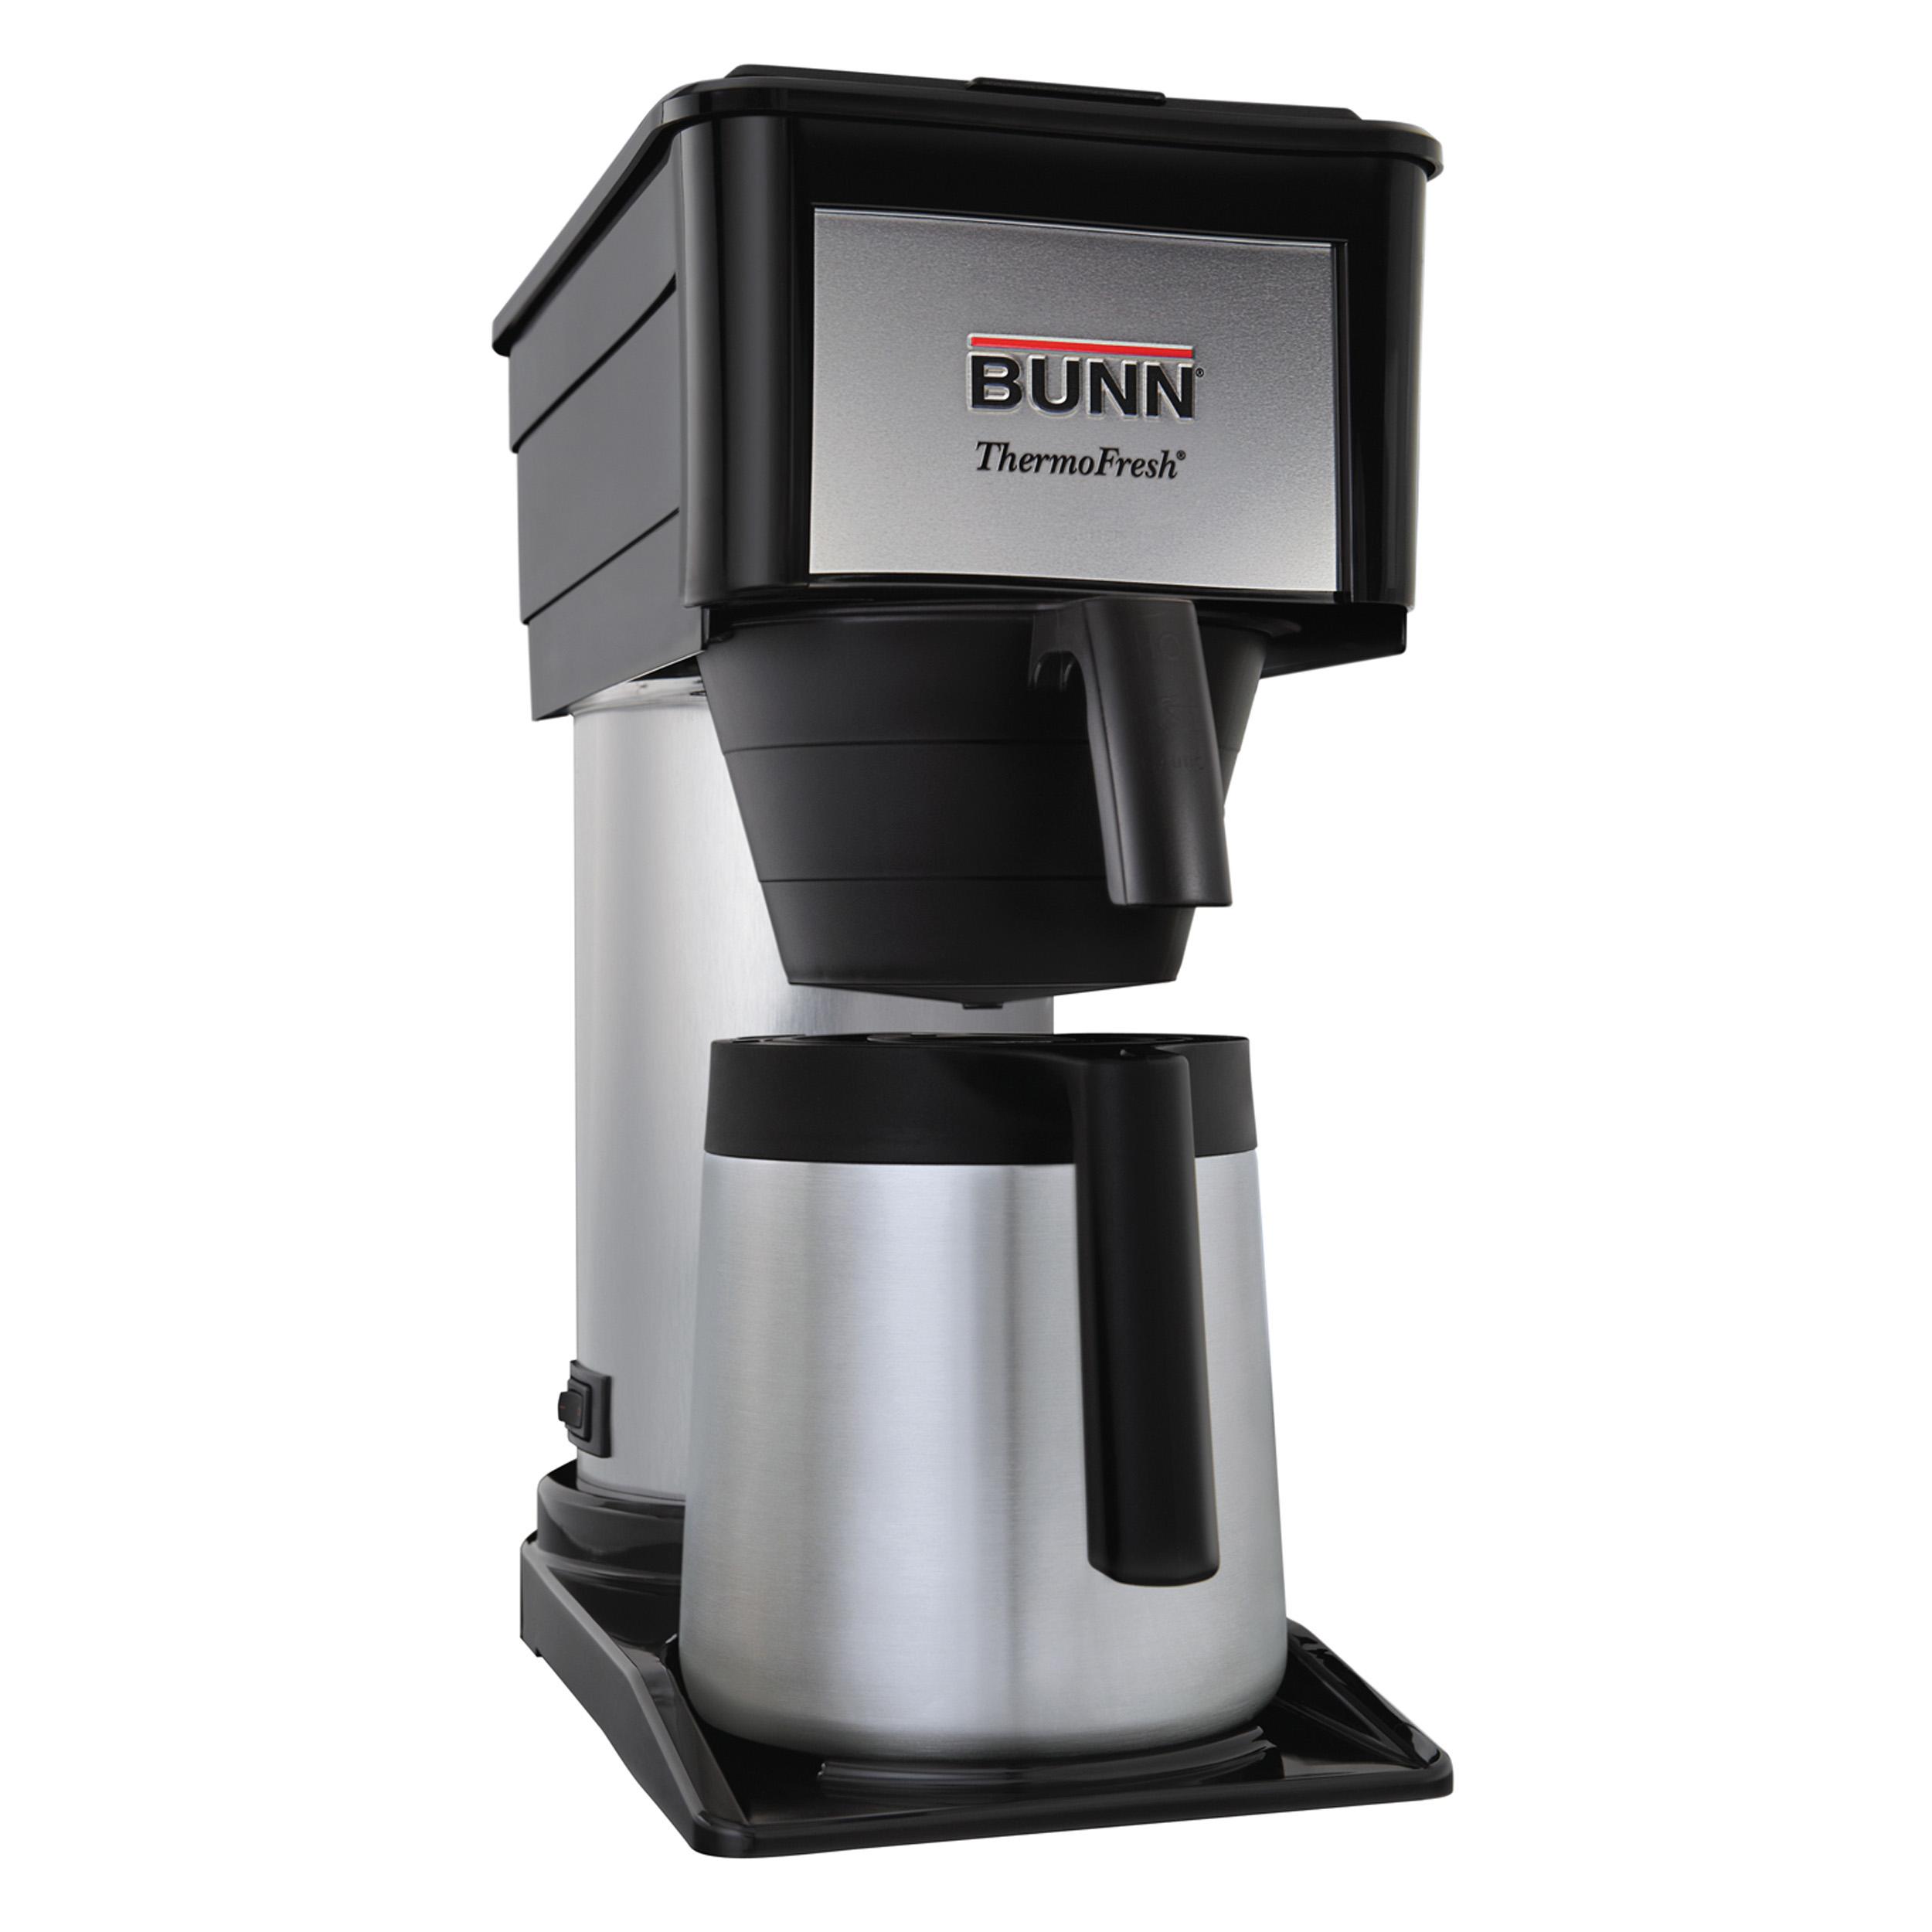 medium resolution of bunn btx b thermofresh 10 cup home thermal carafe coffee brewer blackbunn model bx wiring diagram